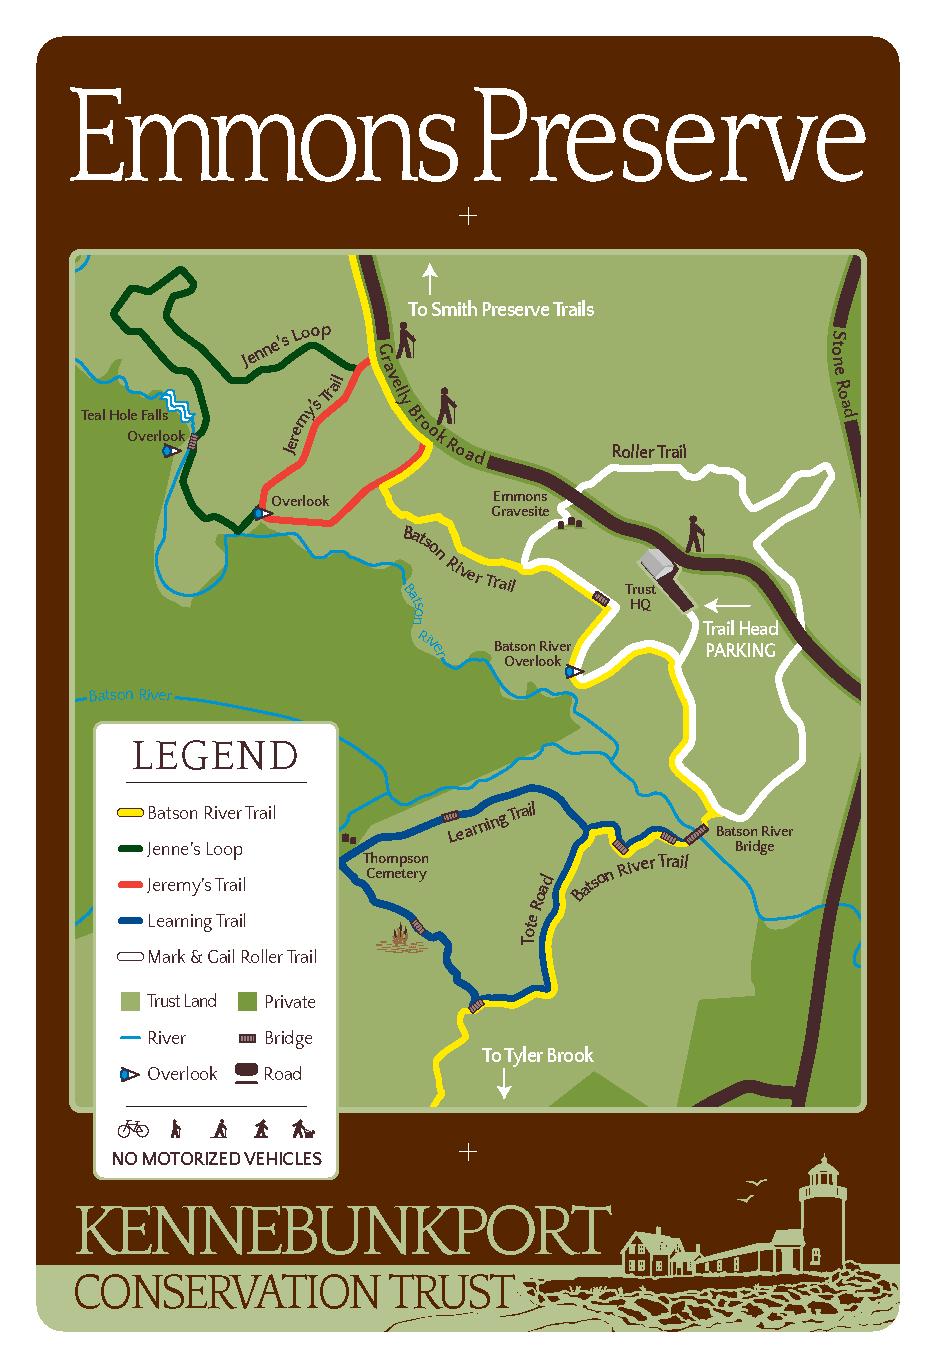 Emmons Preserve Map